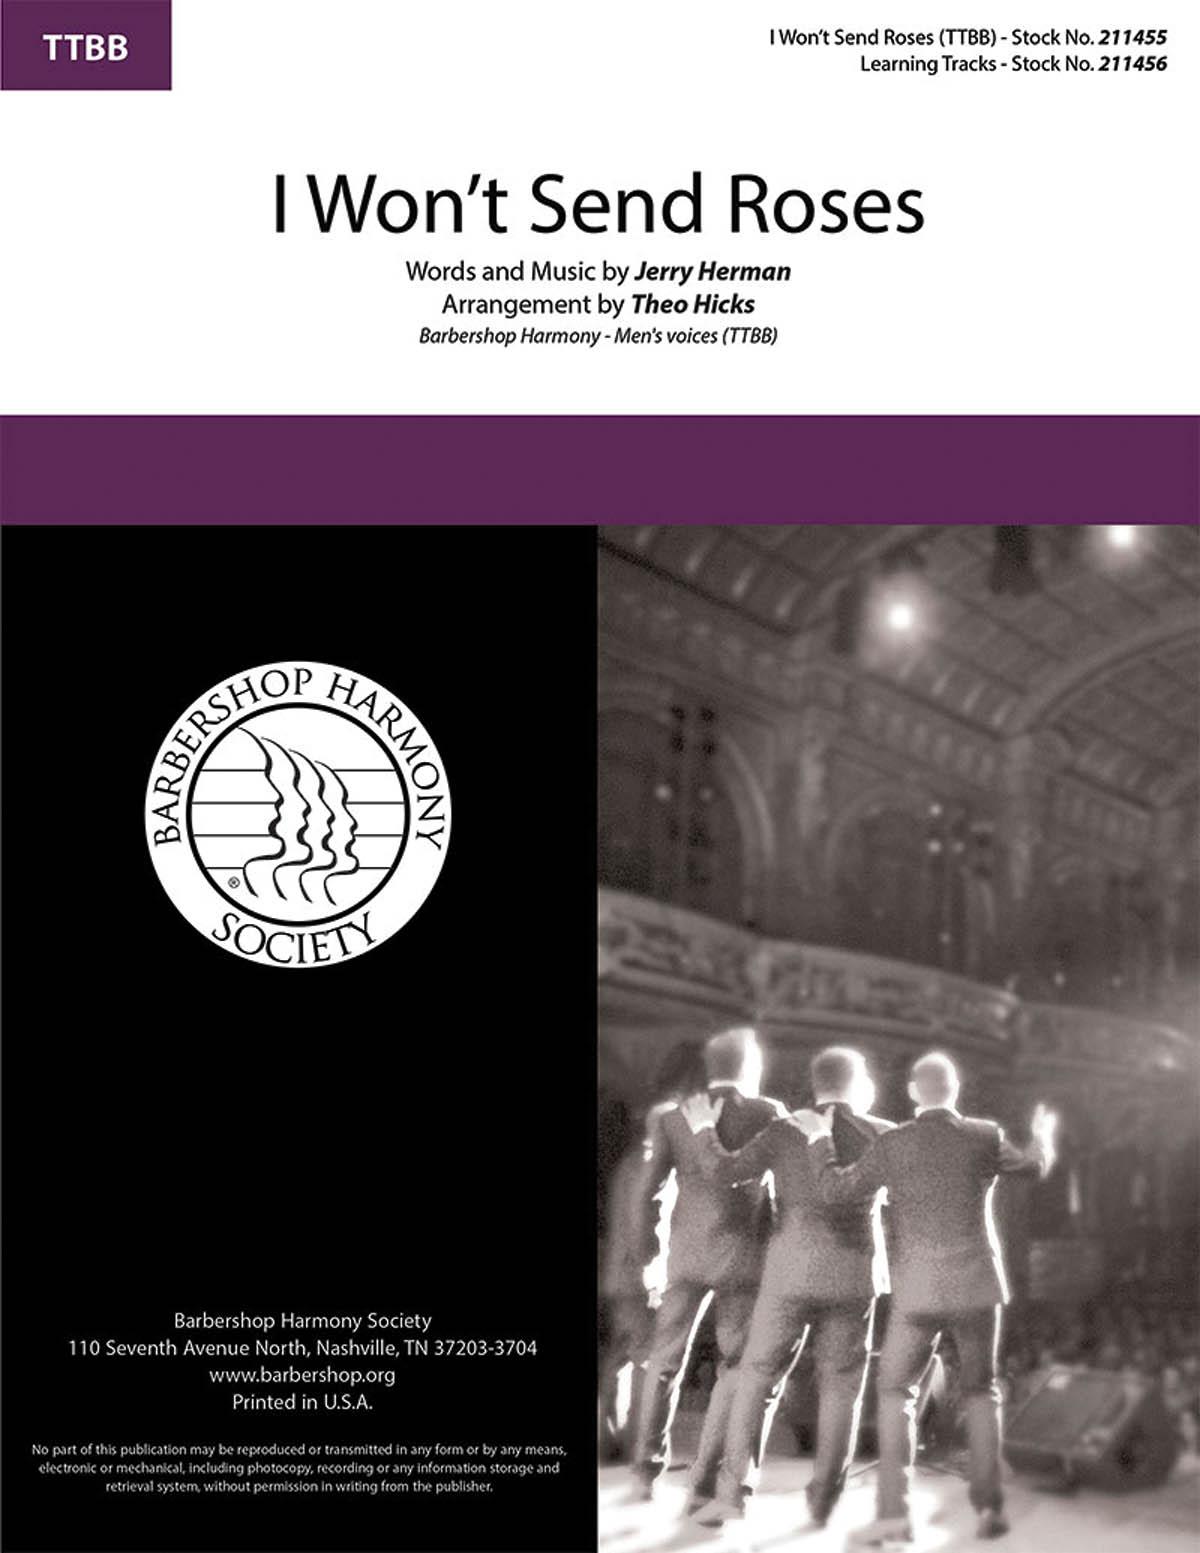 I Won't Send Roses : TTBB : Theo Hicks : Mack and Mabel : Sheet Music : 00276680 : 812817021549